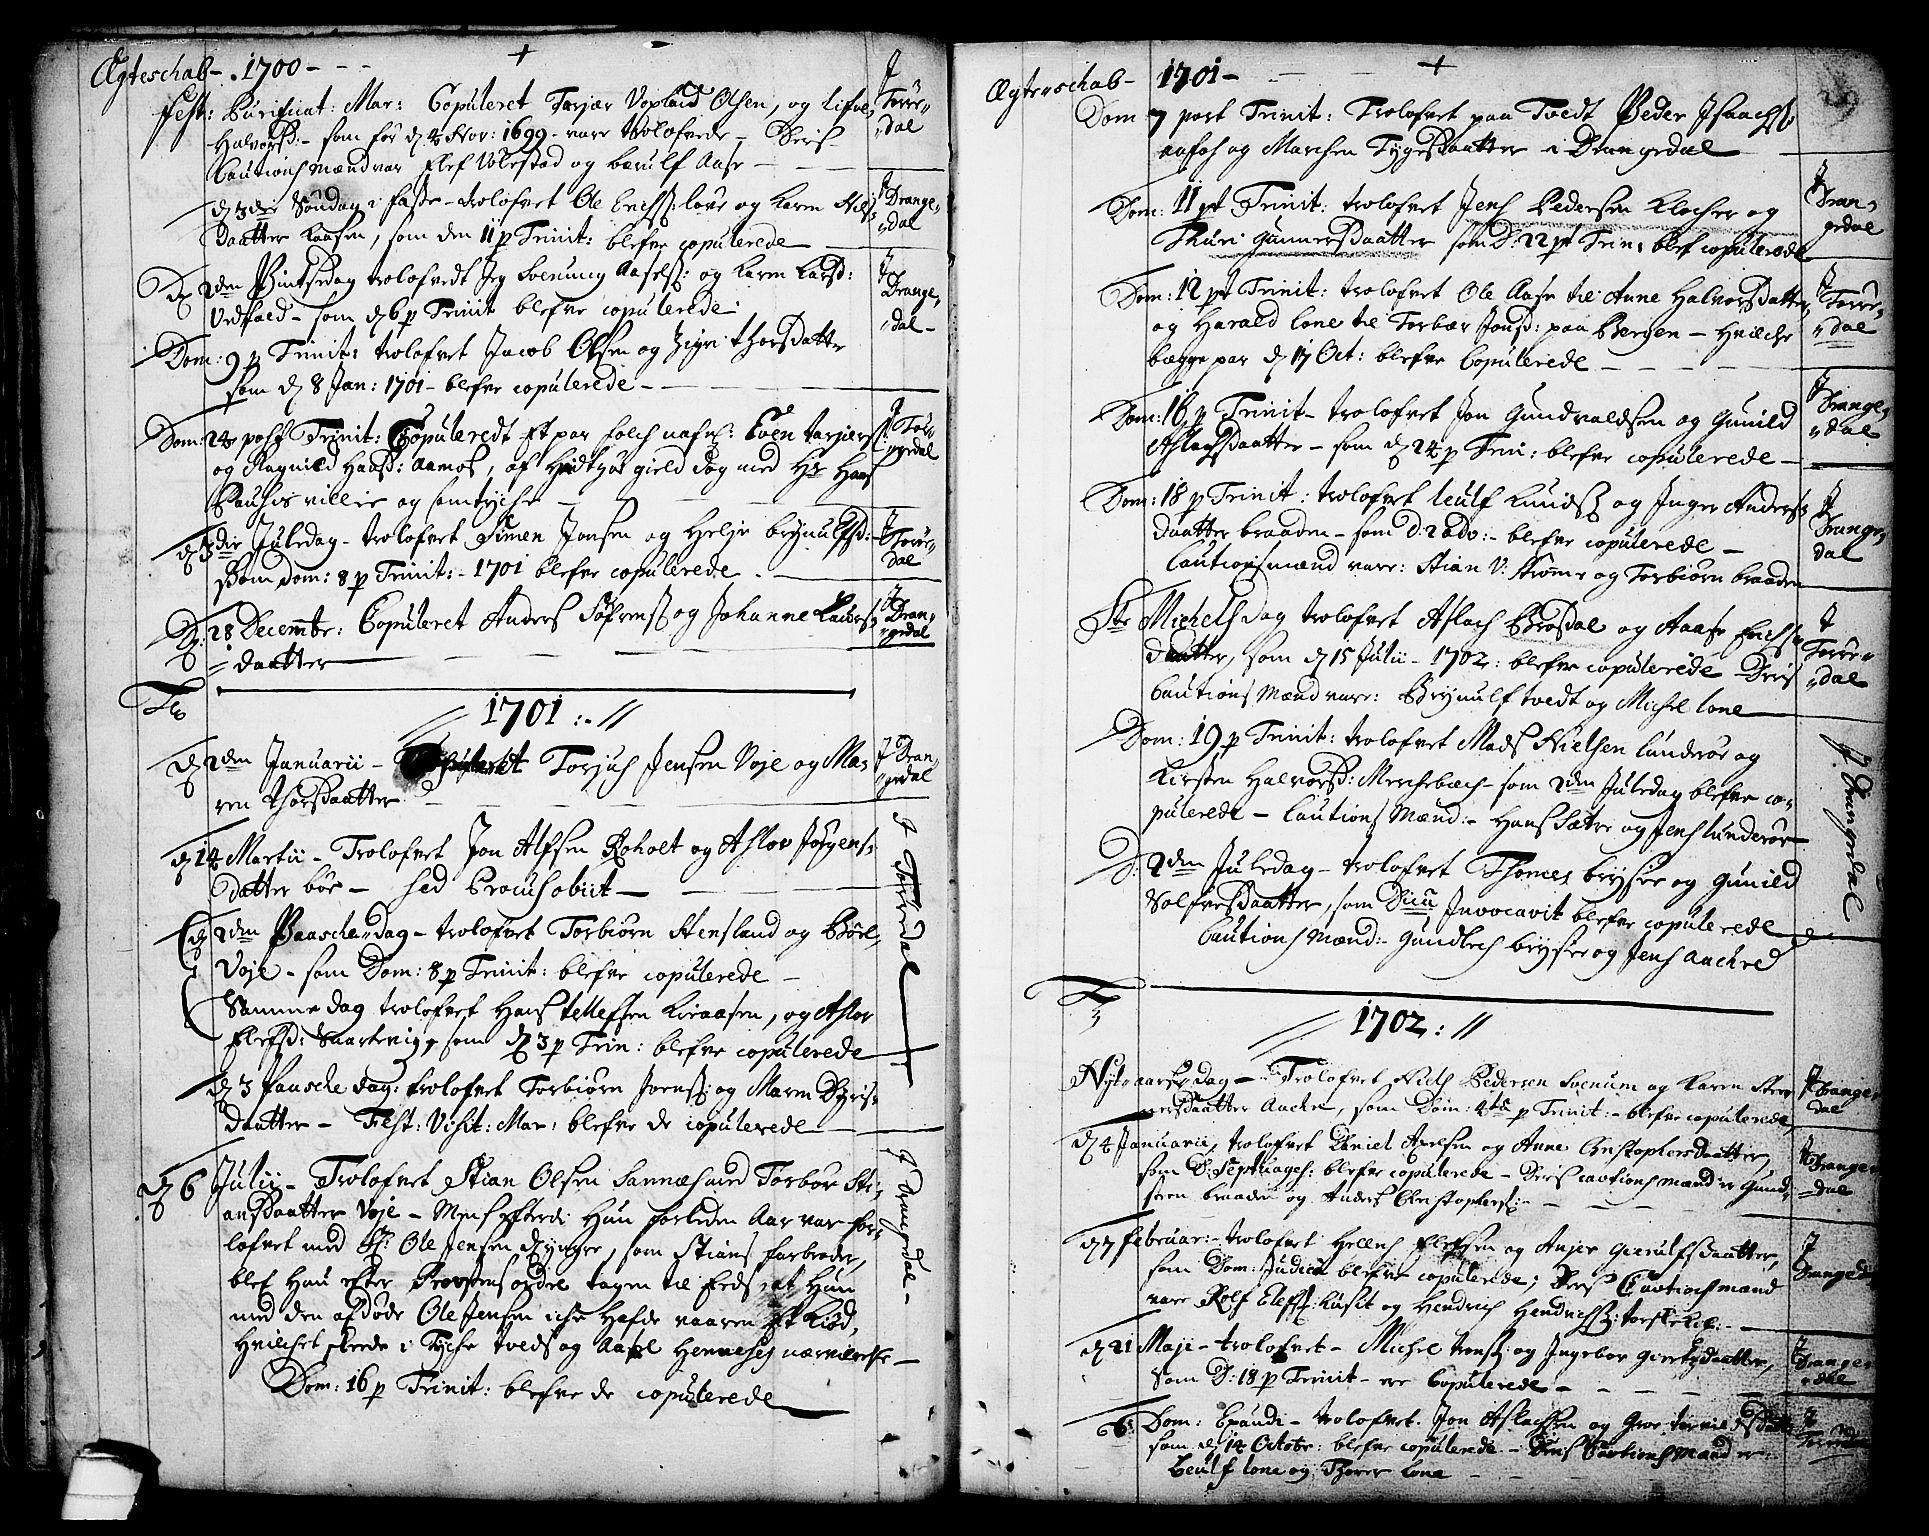 SAKO, Drangedal kirkebøker, F/Fa/L0001: Ministerialbok nr. 1, 1697-1767, s. 29